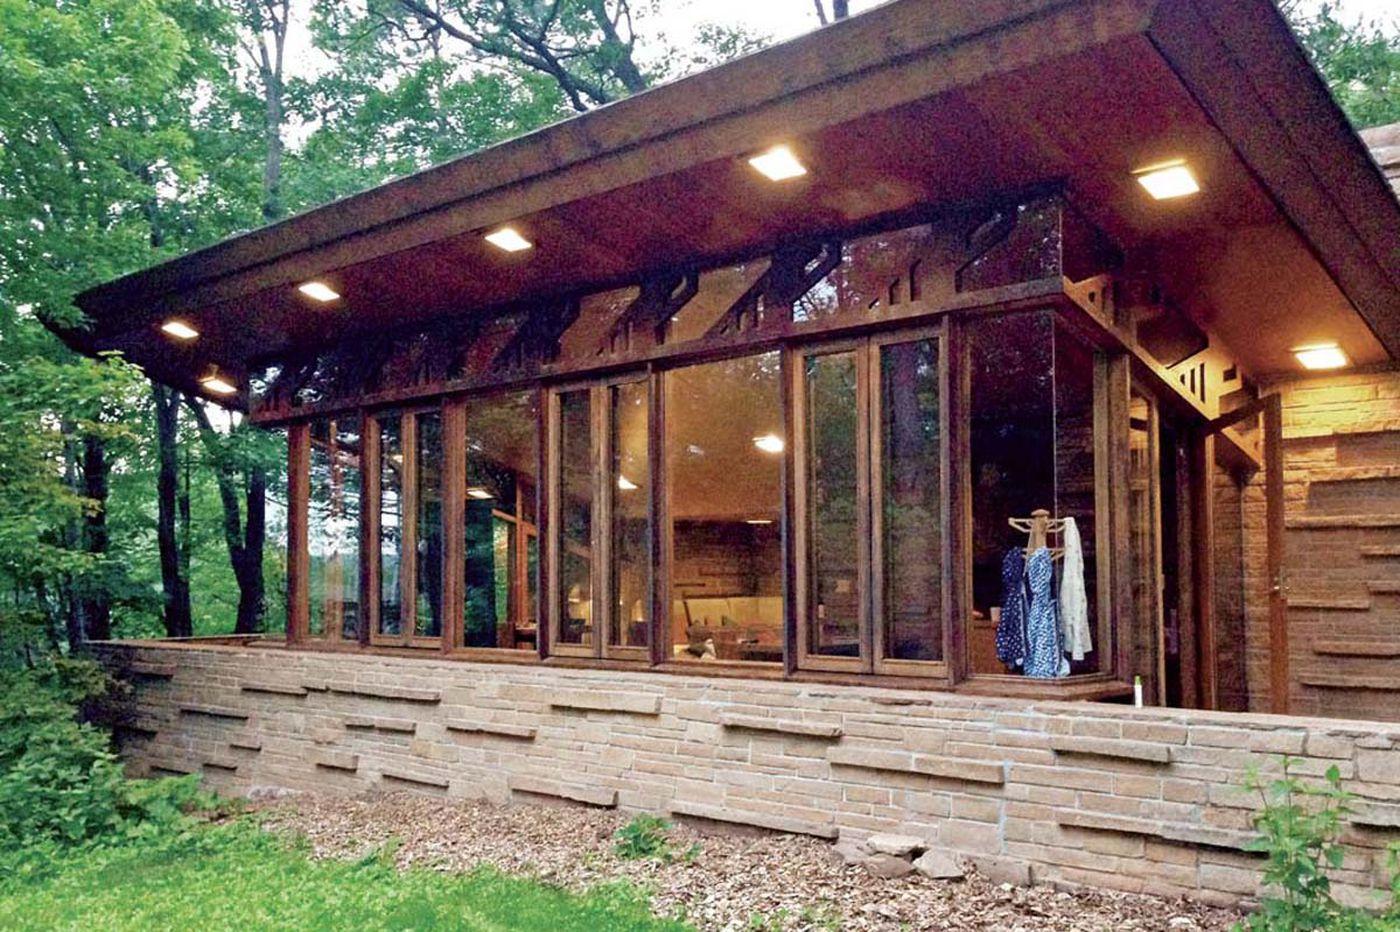 Frank Lloyd Wright's last, tragic masterpiece